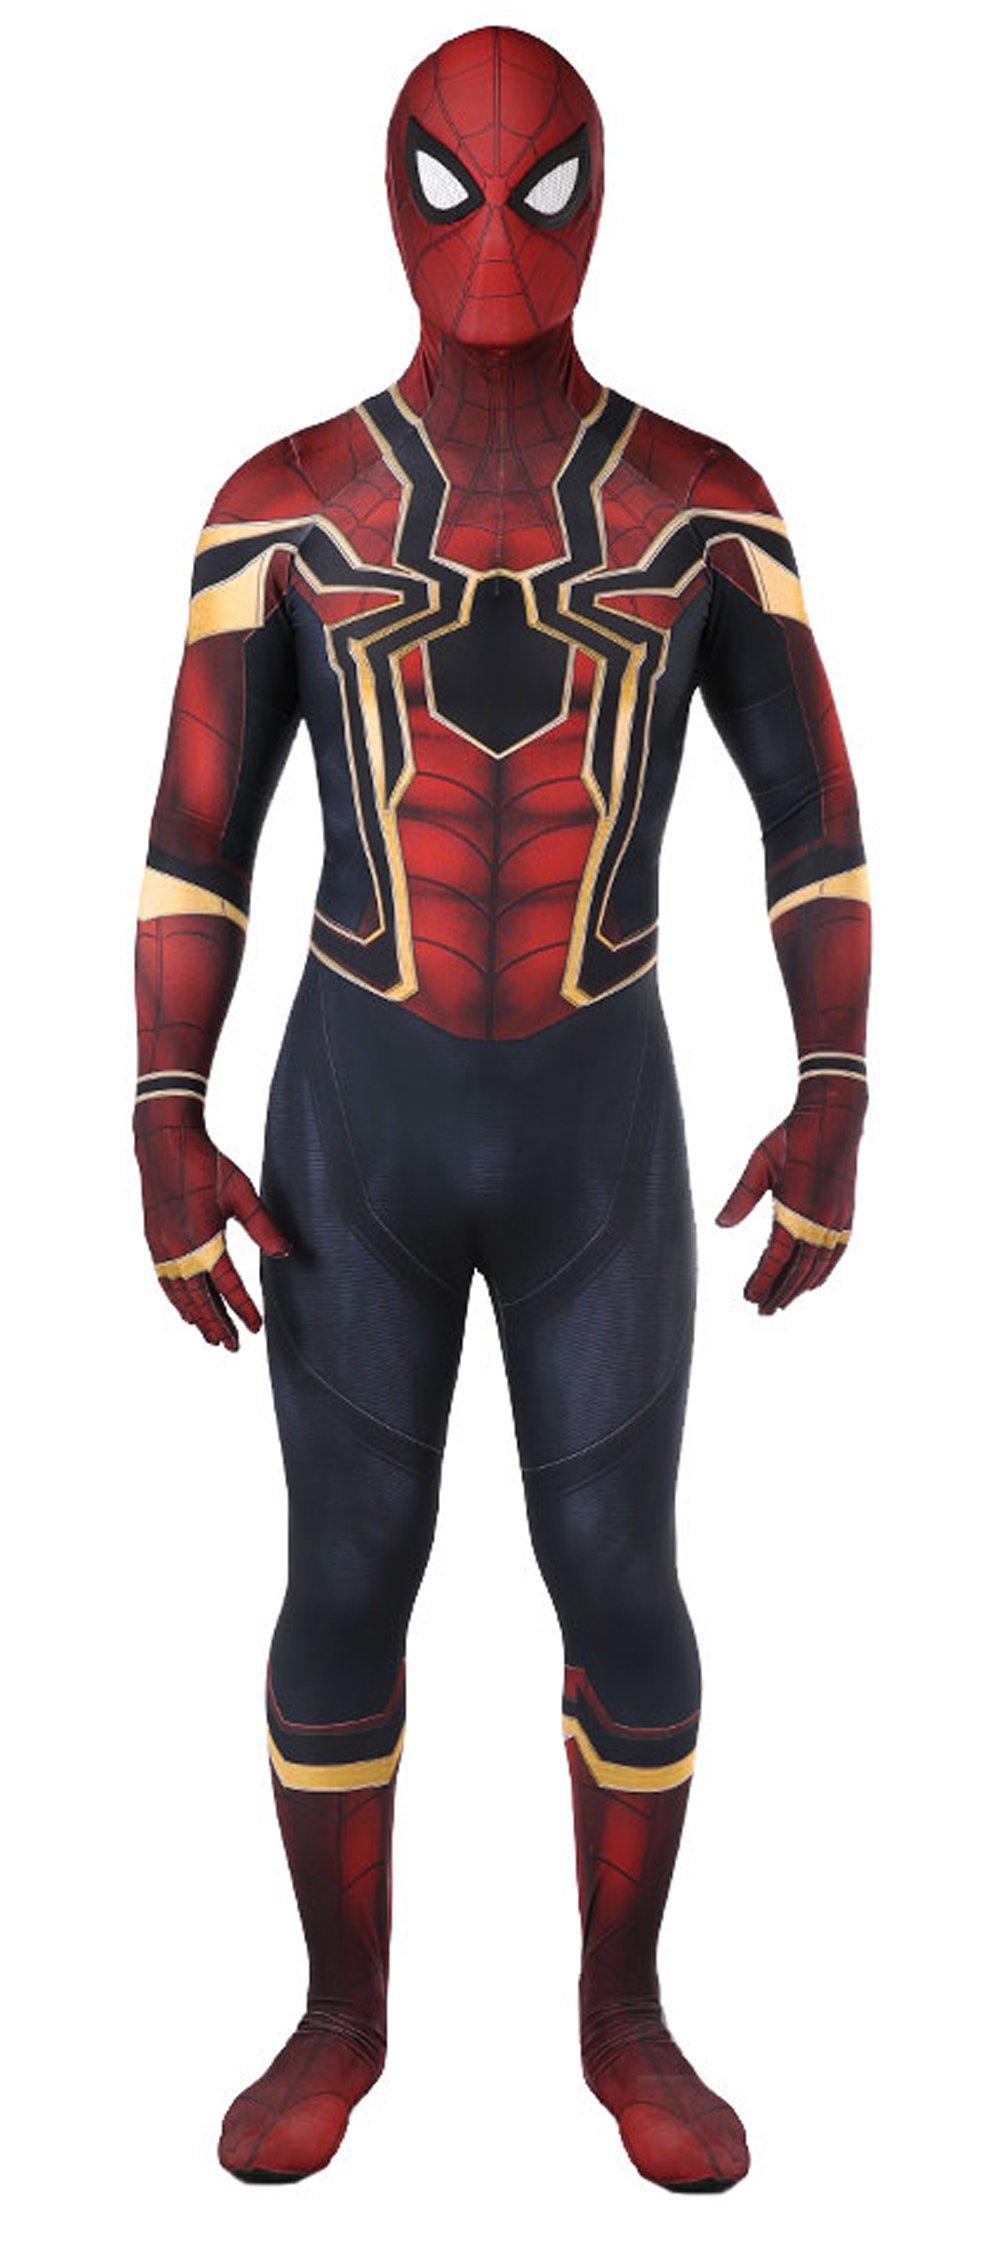 - 712A01ZFR L - Legends Superhero Cosplay Costumes Lycra Spandex Zentai Halloween Costumes Adult/Kids 3D Style